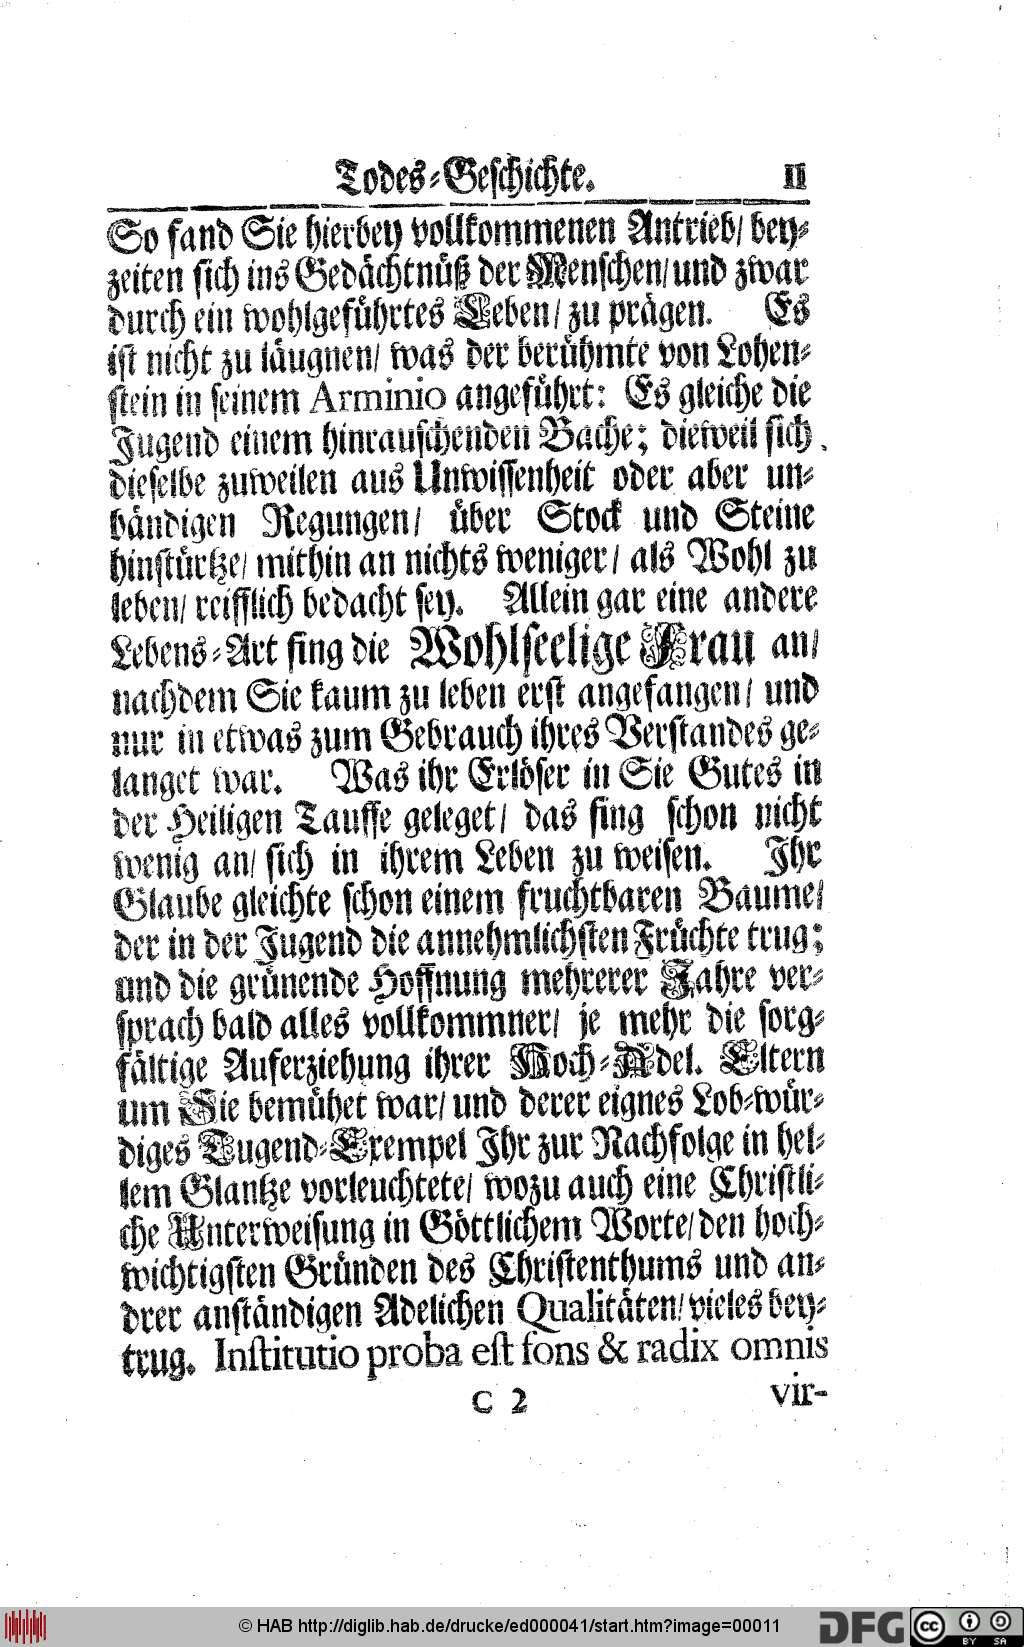 http://diglib.hab.de/drucke/ed000041/00011.jpg